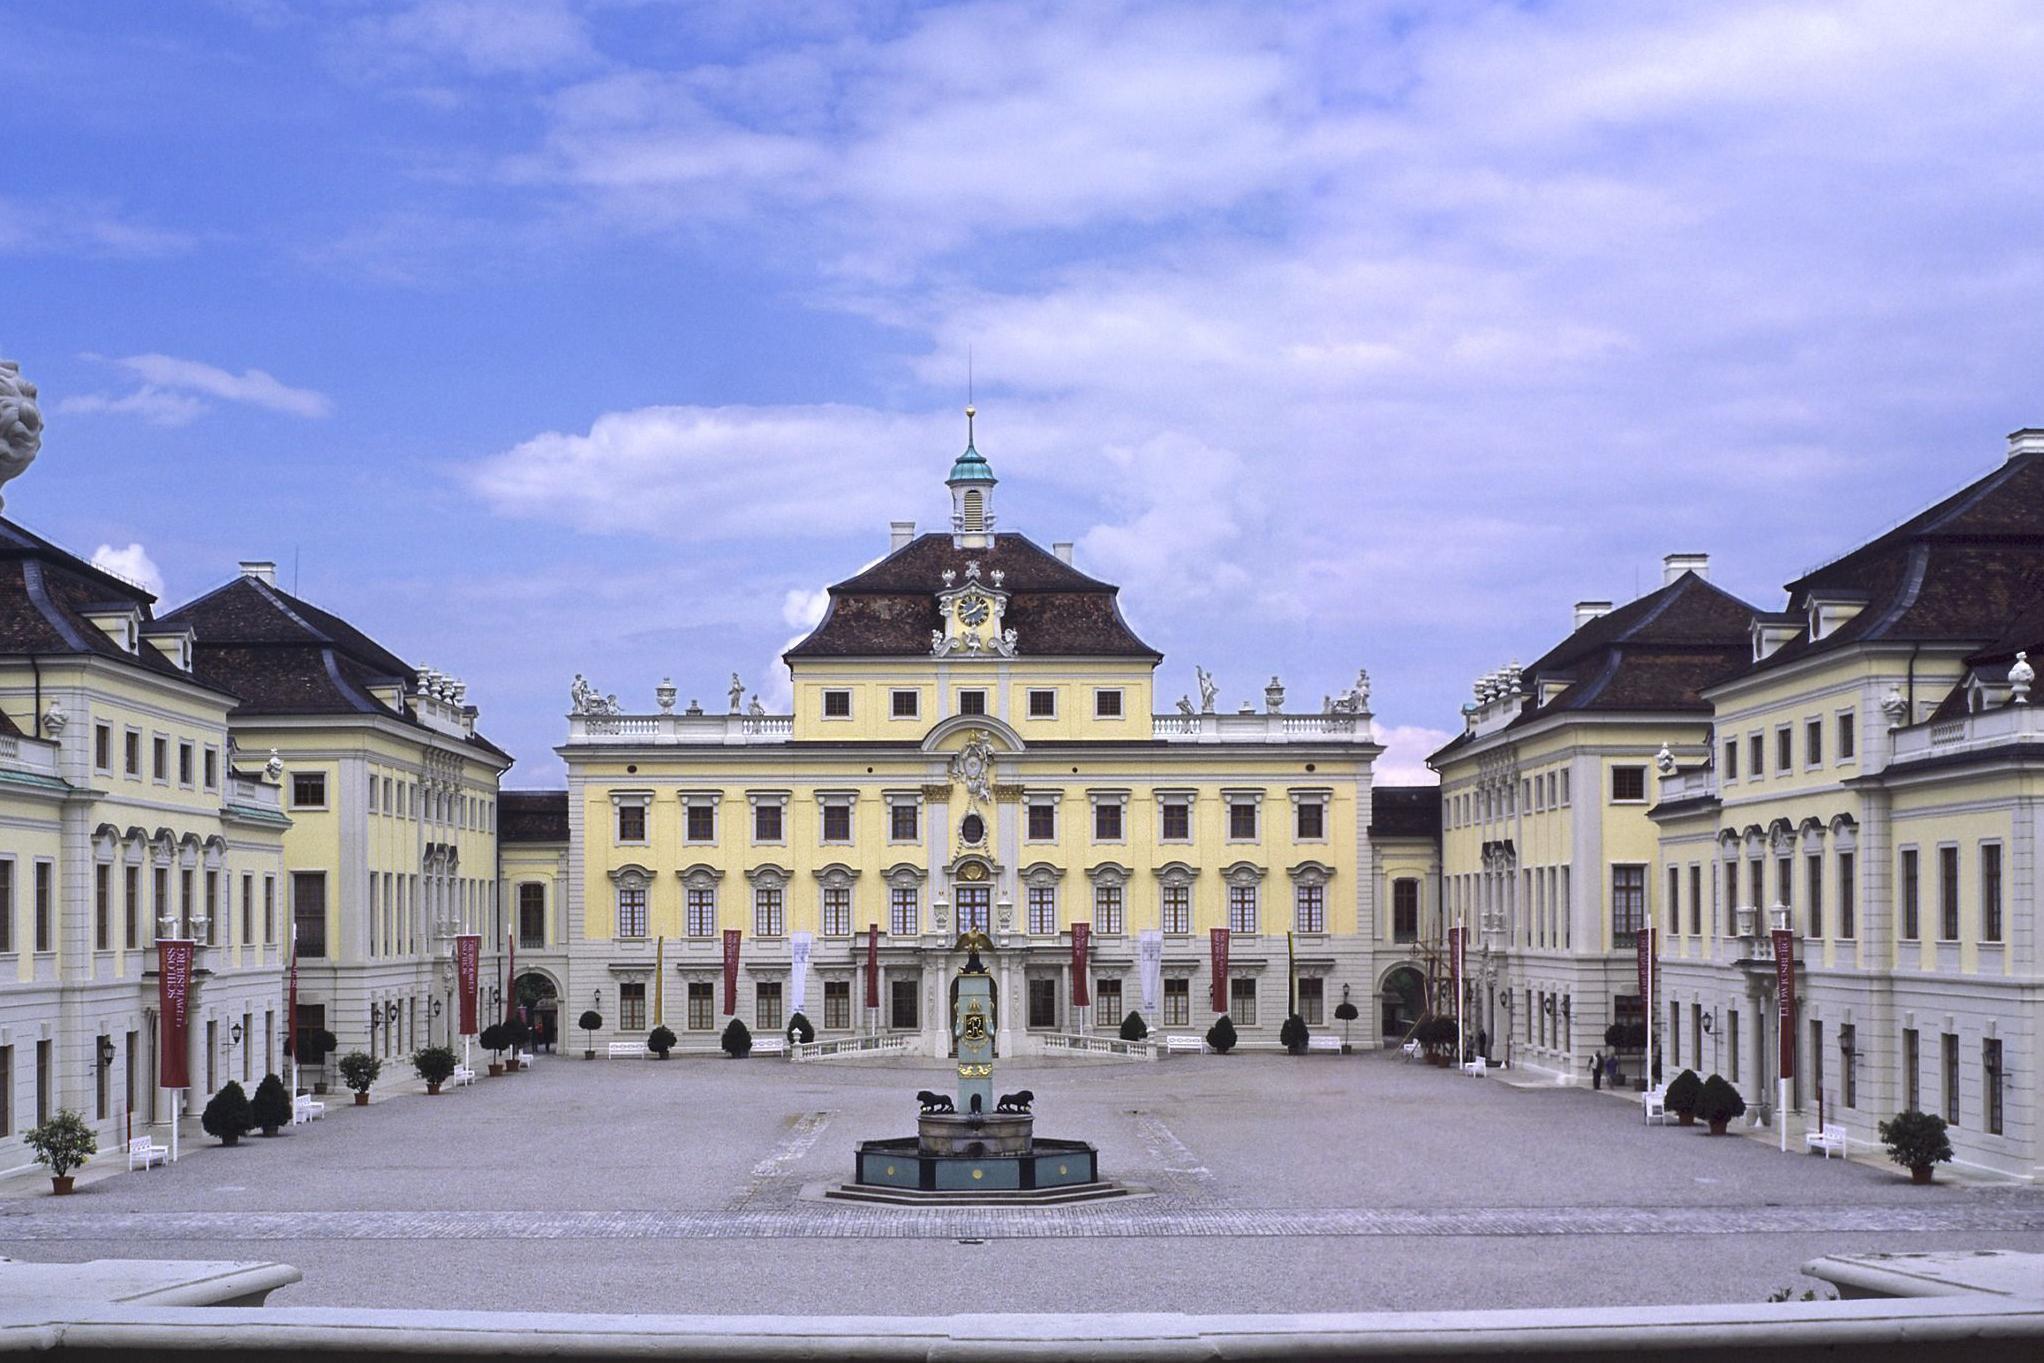 Führungen Schloss Ludwigsburg